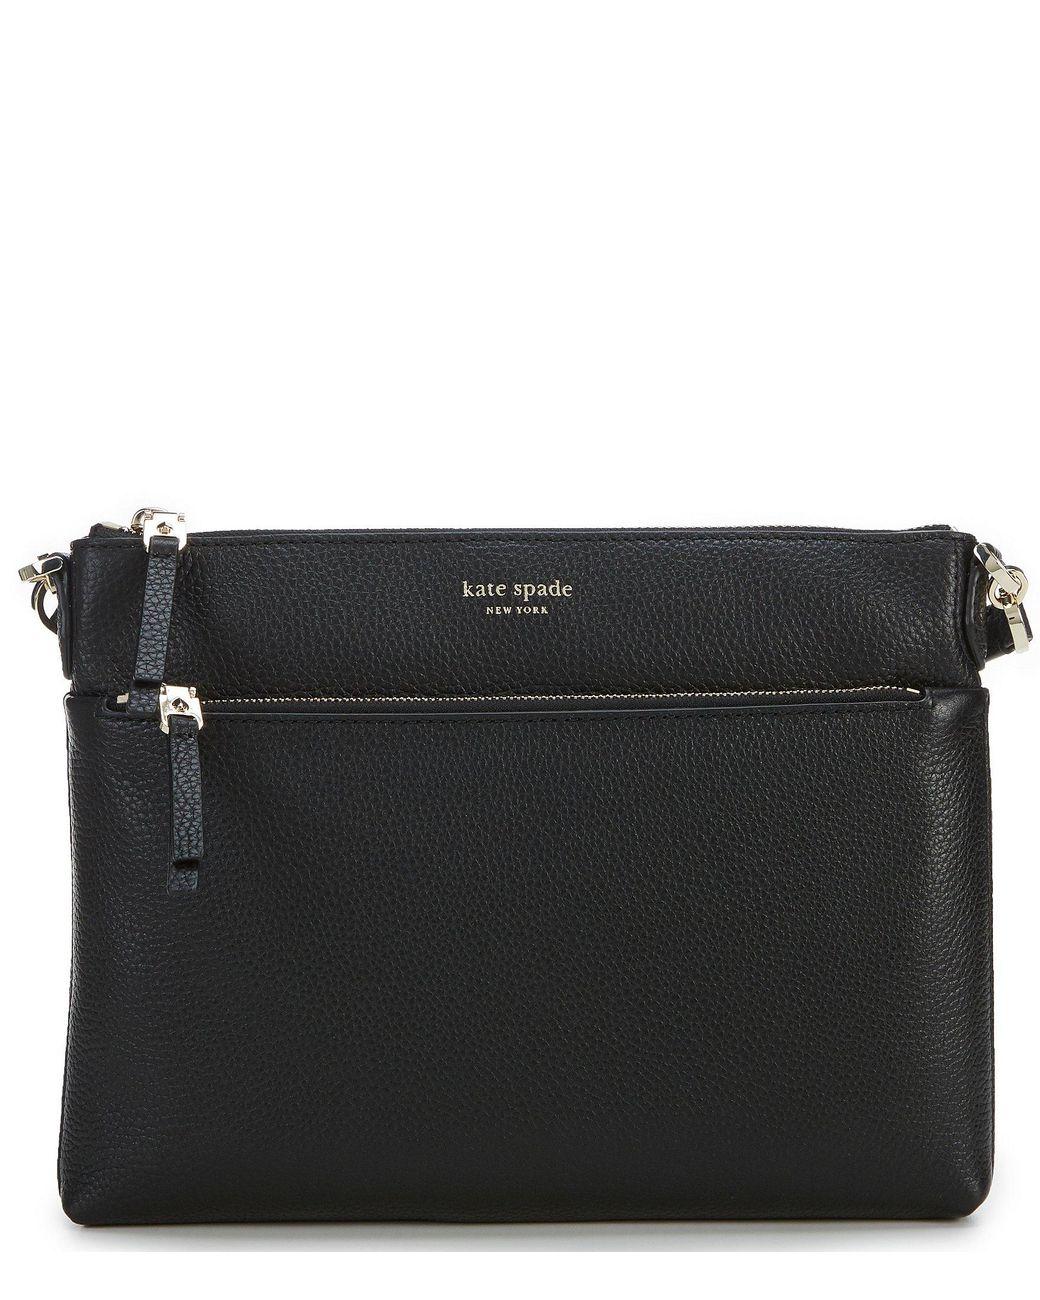 dd51402f9d6c Lyst - Kate Spade Polly Medium Top Zip Cross-body Bag in Black